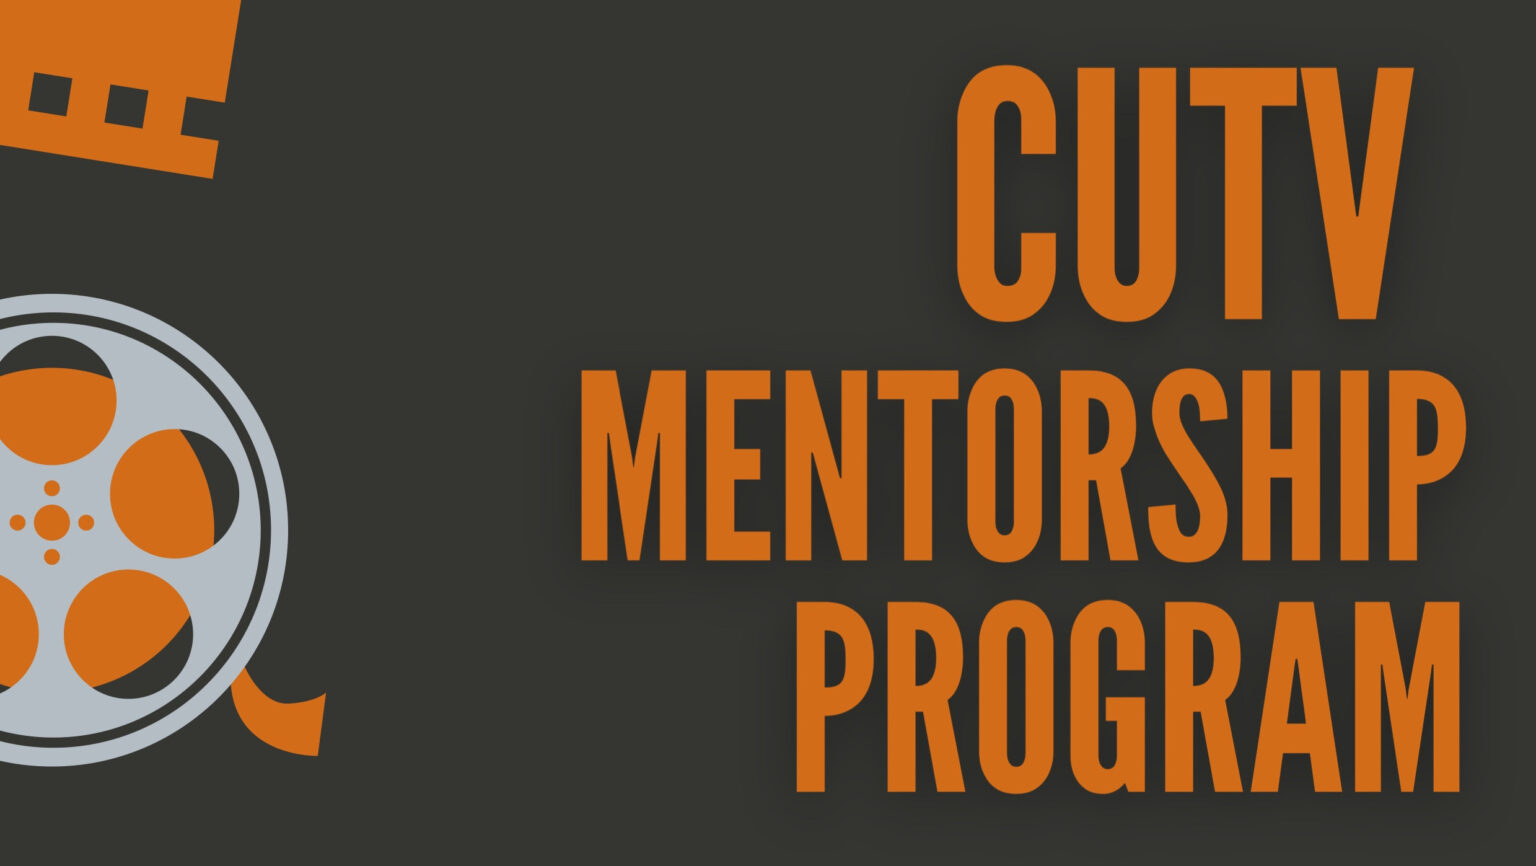 CUTV mentorship program